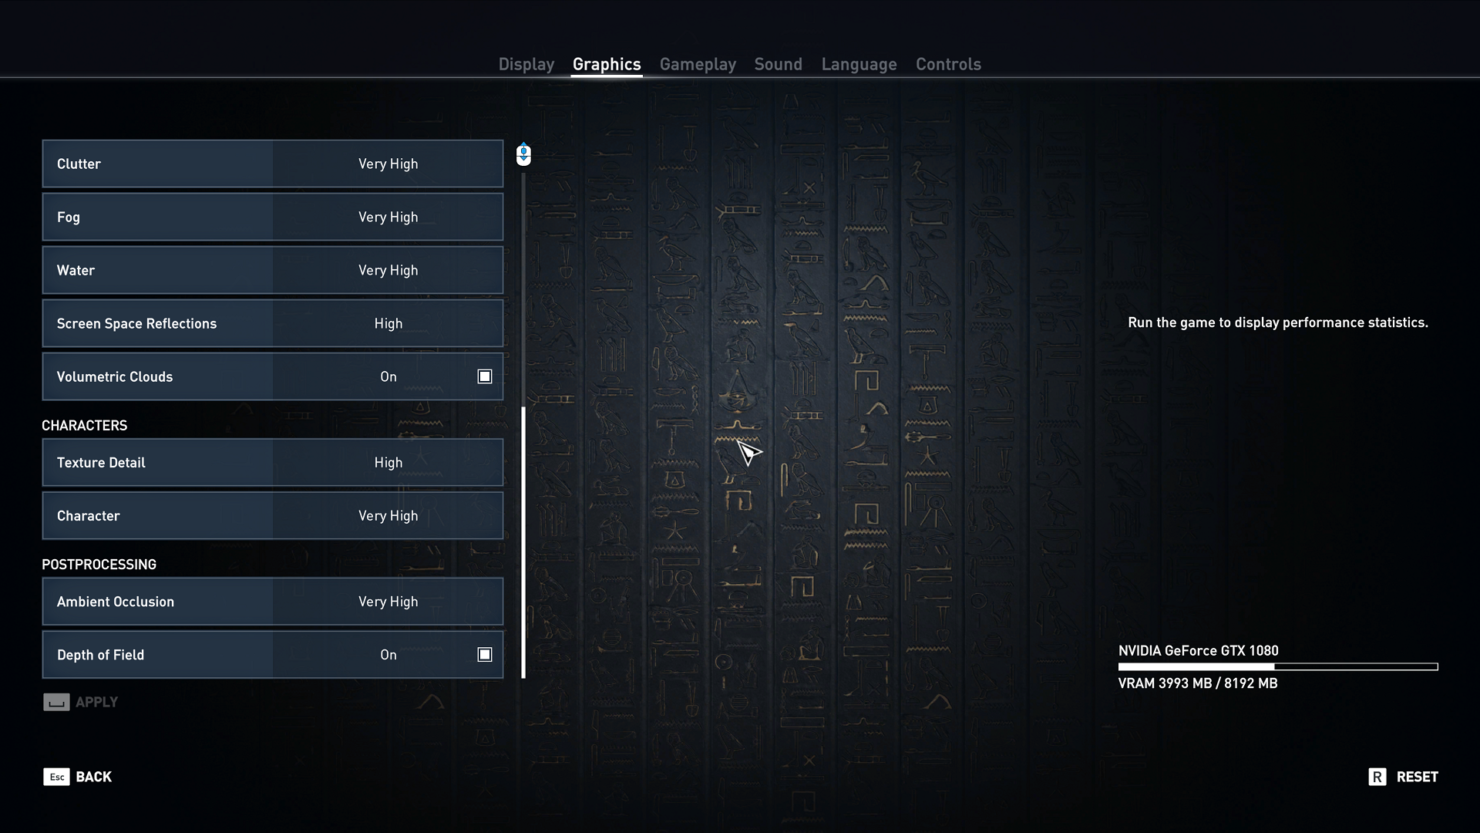 assassins-creed-origins-screenshot-2017-10-26-13-59-27-64-2